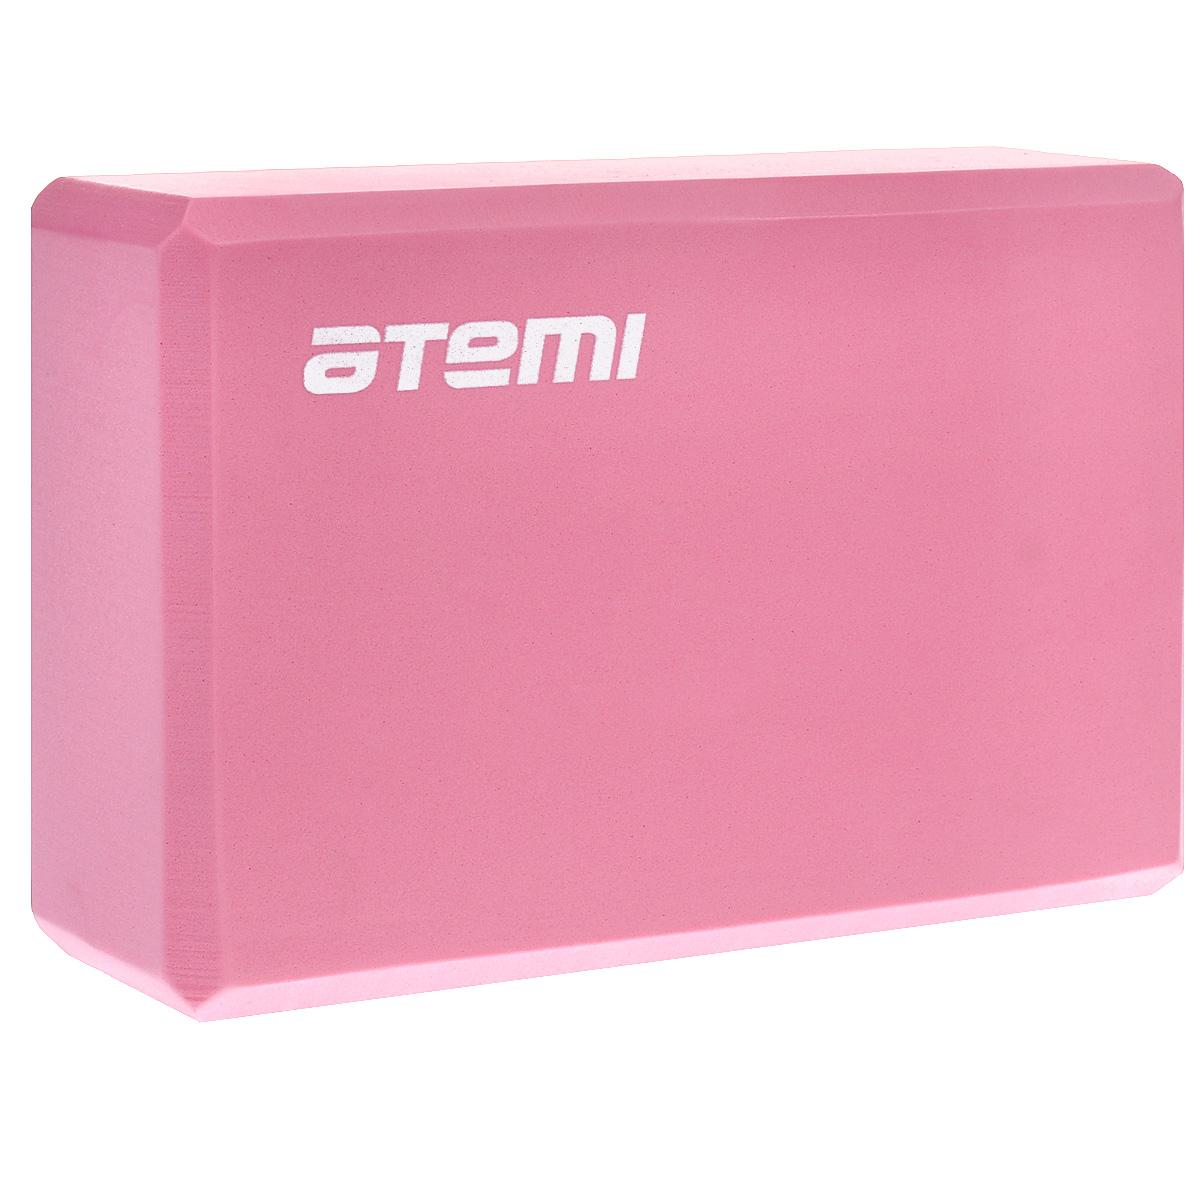 Фото Блок для йоги Atemi, цвет: розовый, 23 х 15 х 8 см. Купить  в РФ